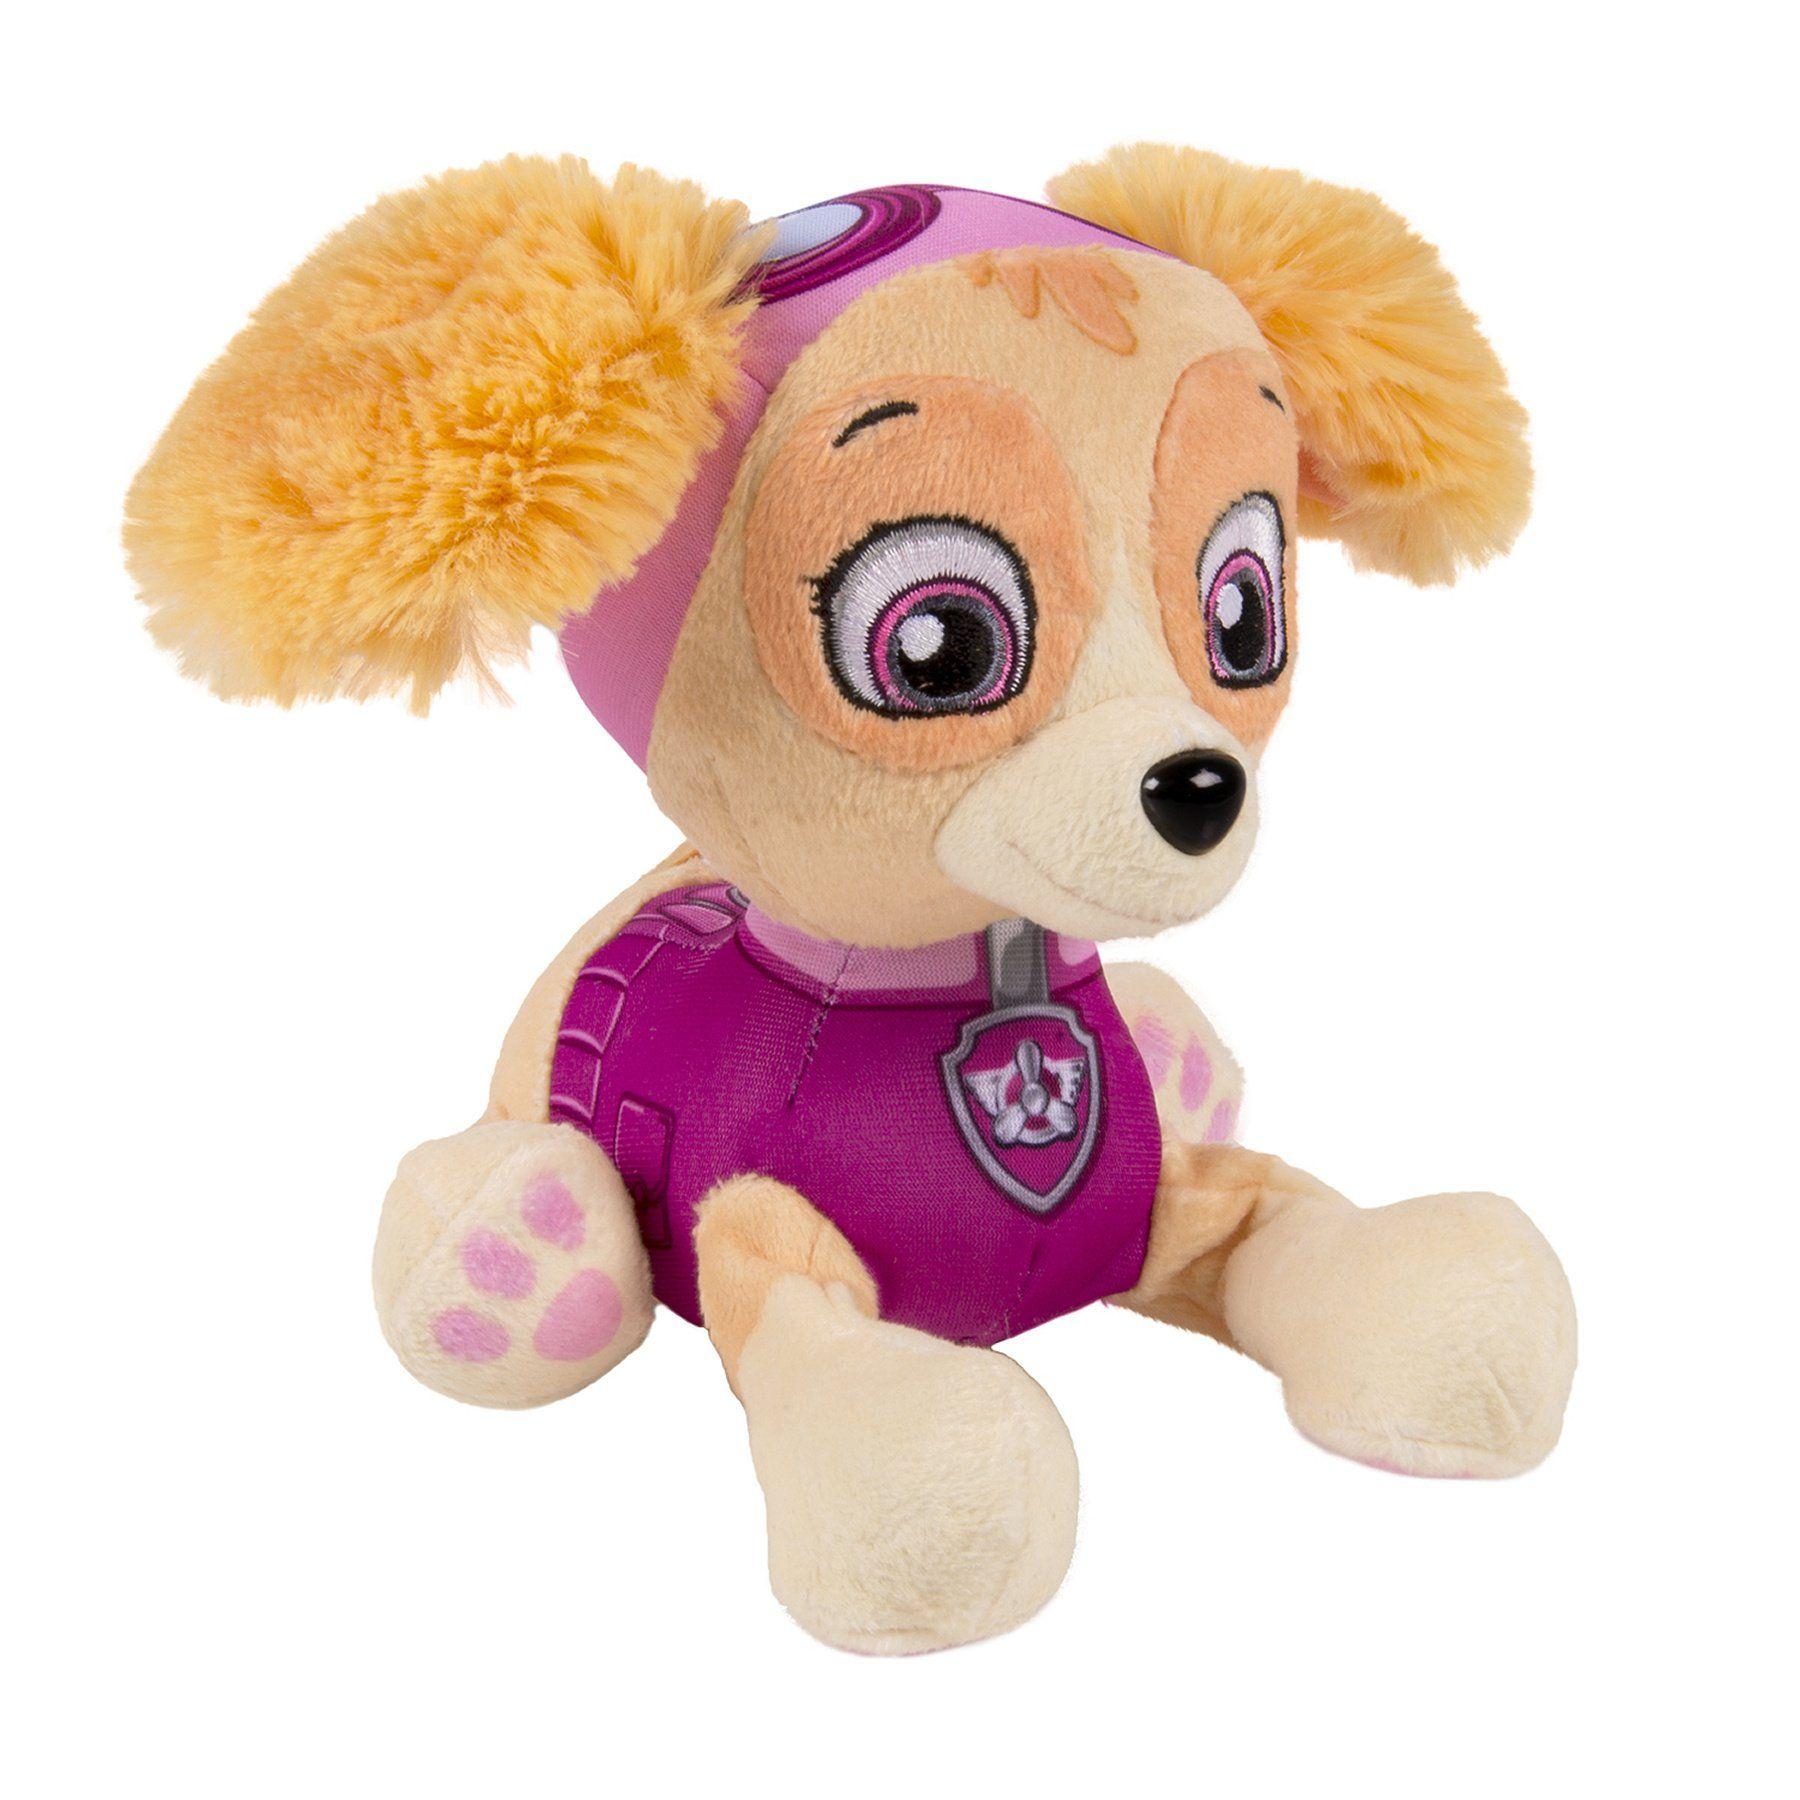 Amazon Com Nickelodeon Paw Patrol Plush Pup Pals Skye Toys